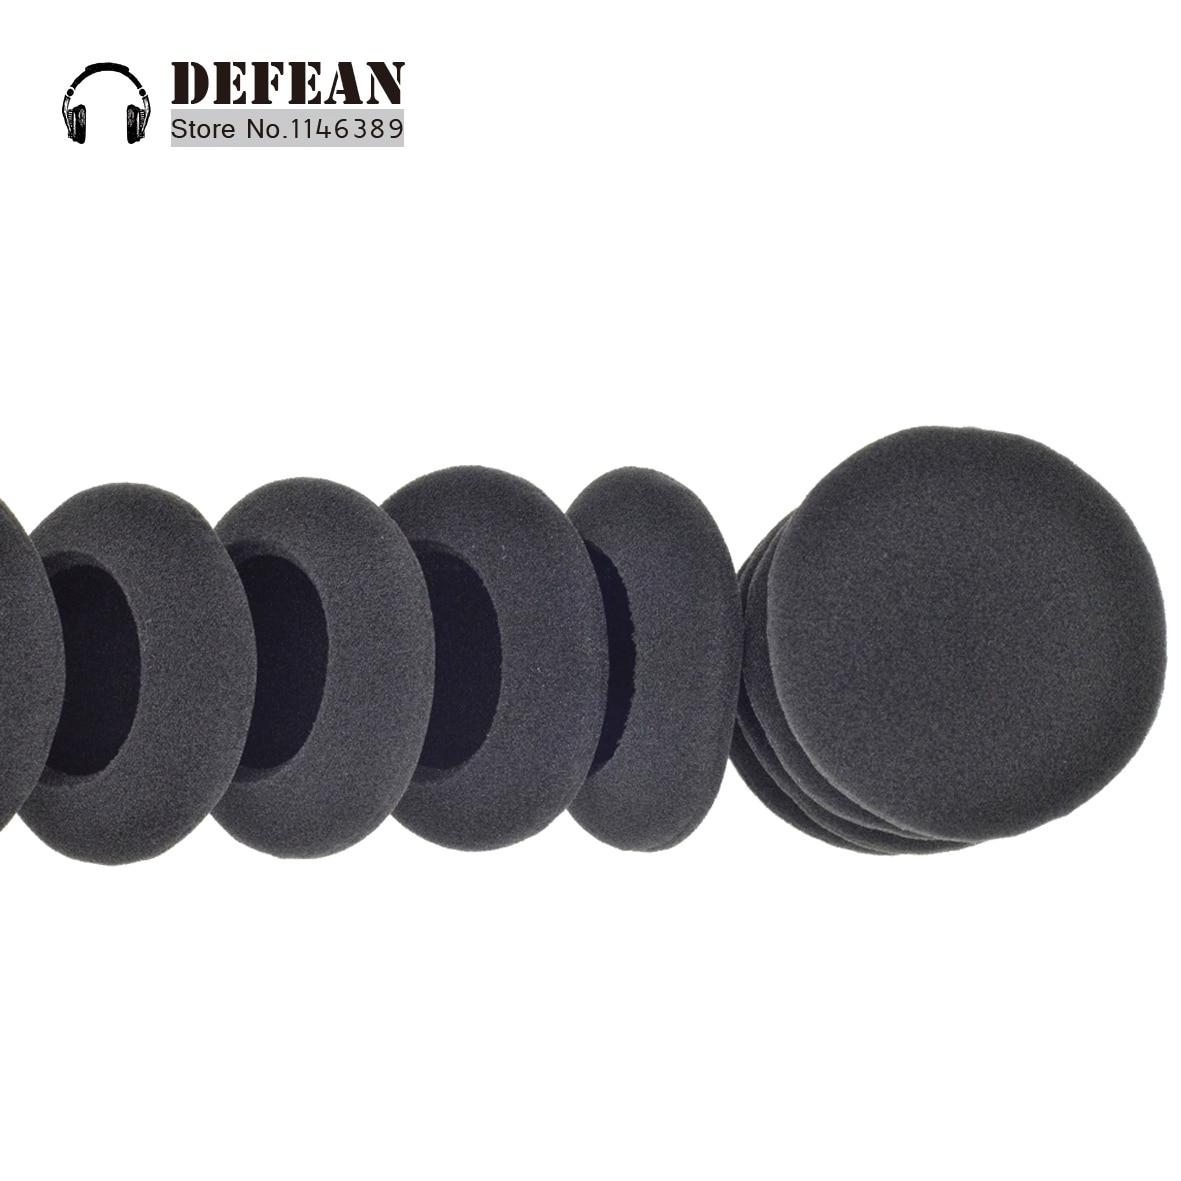 Almohadón negro de espuma de 10 Uds para koss pp sp ksc35 ksc75 portapro headphoneFree shipping alistore